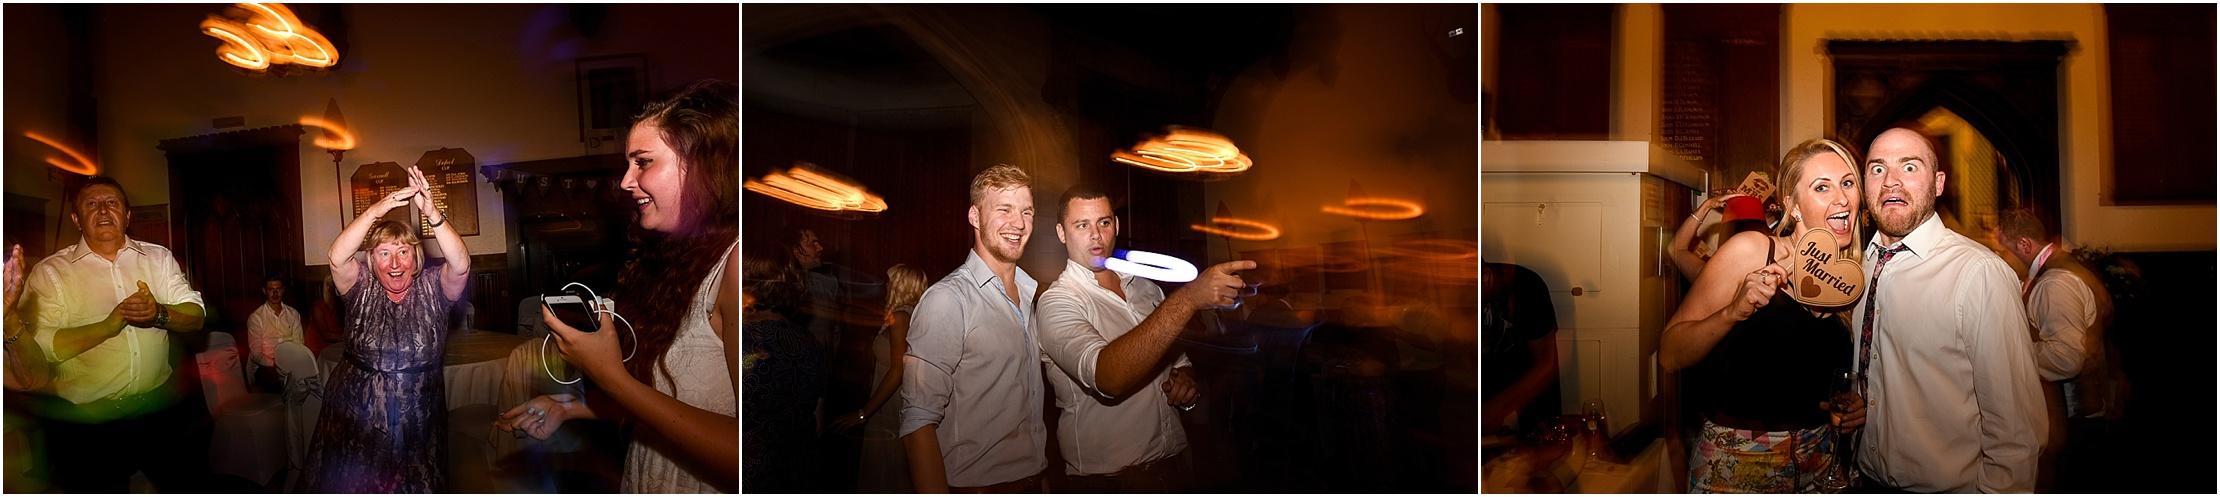 ashton-hall-wedding - 114.jpg